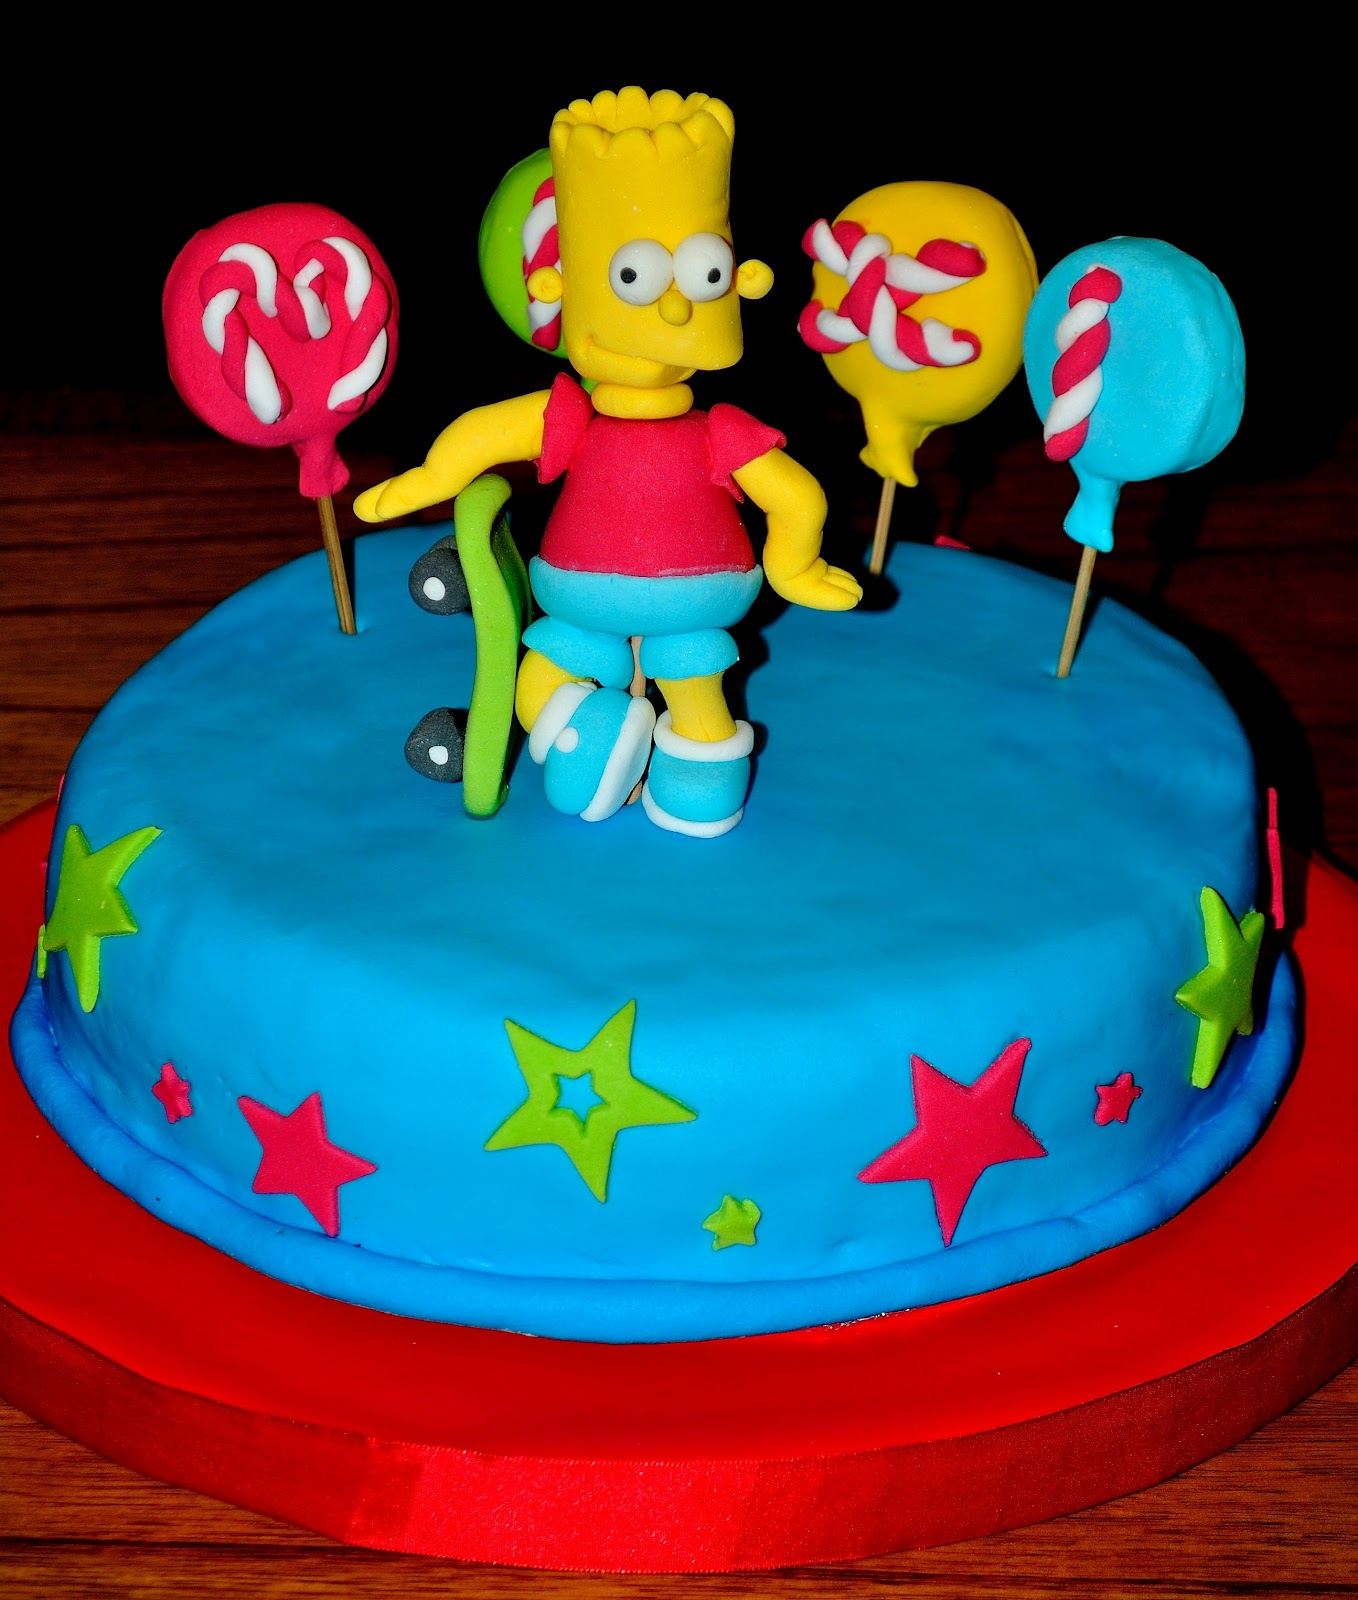 Divinas Sensaciones - Pastelerìa artesanal: Tortas